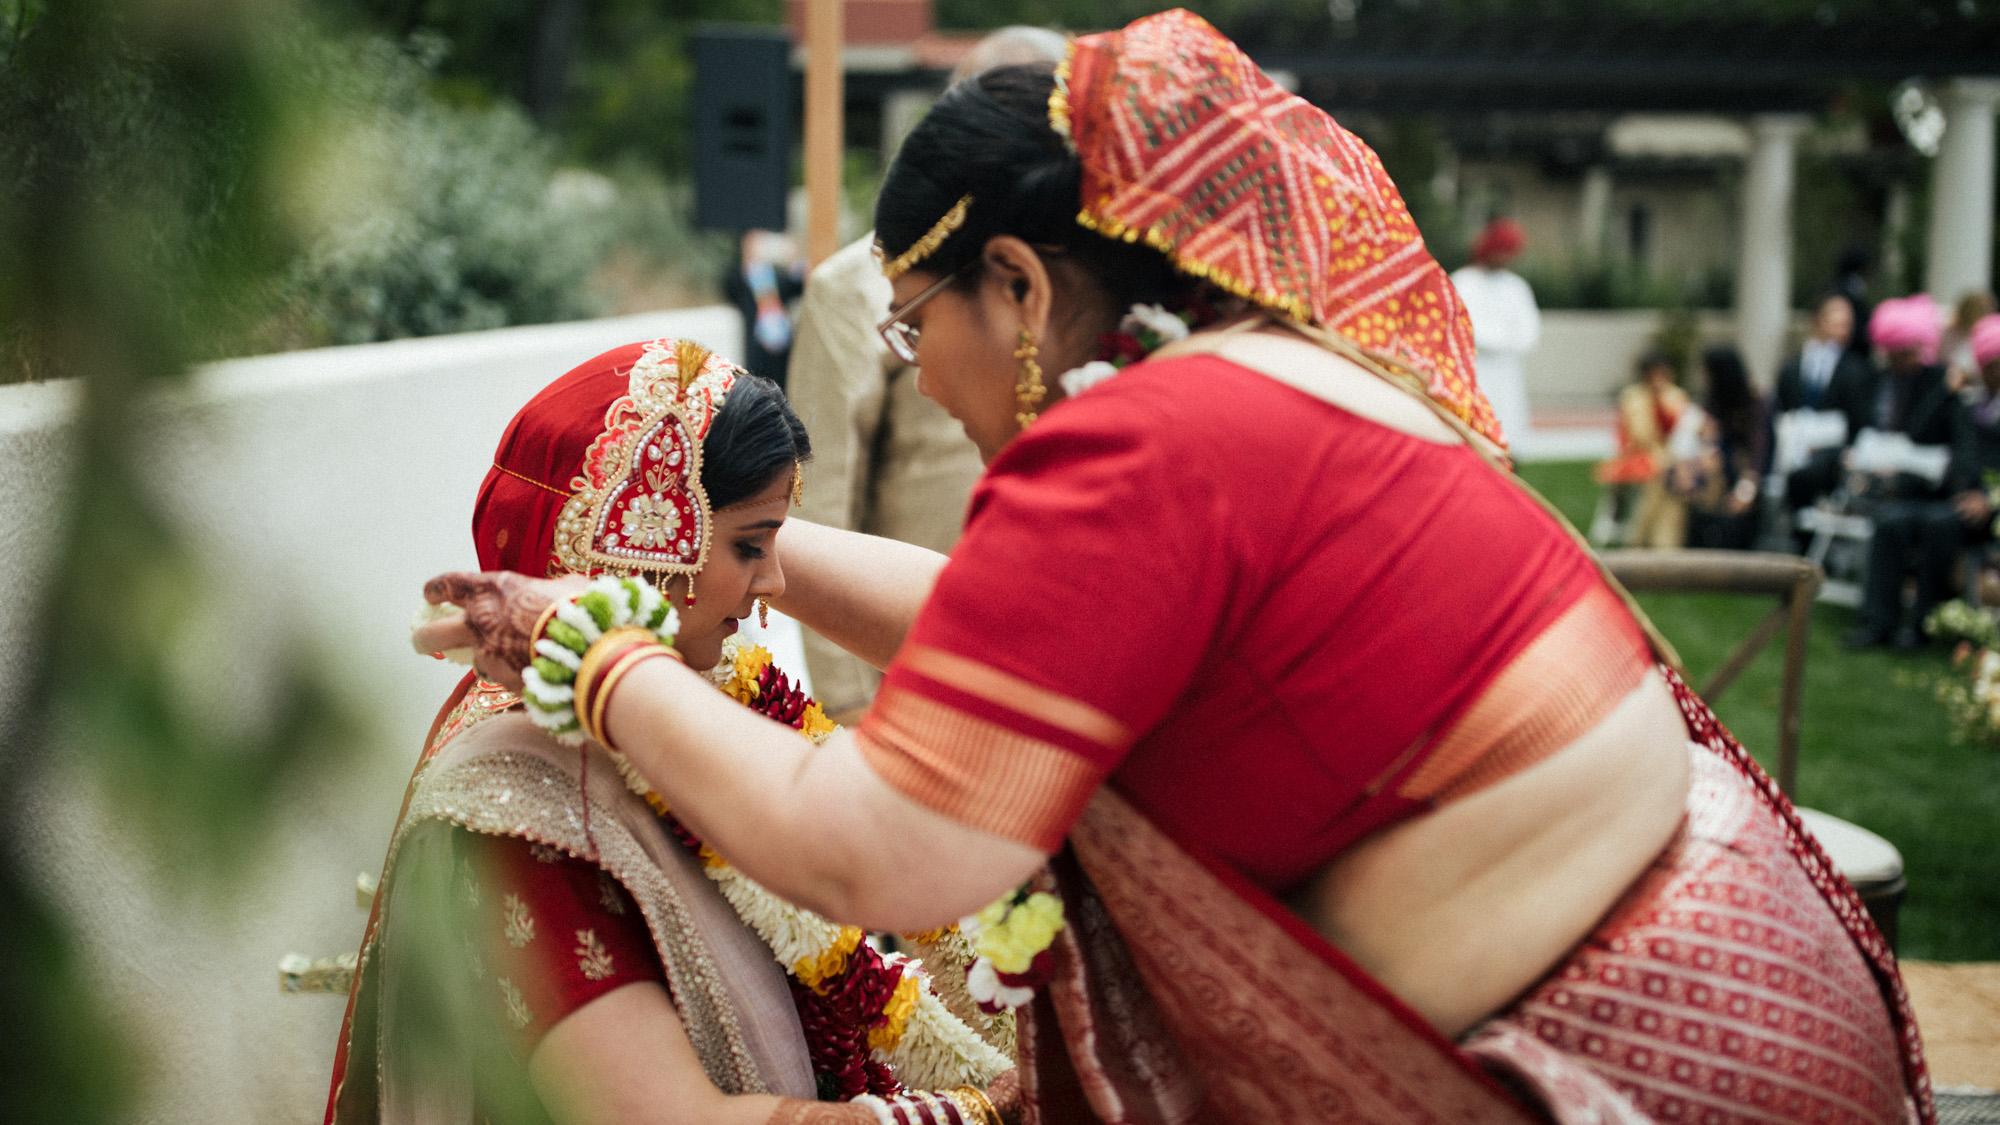 anu_maneesh_alec_vanderboom_Indian_wedding_photography-0099.jpg